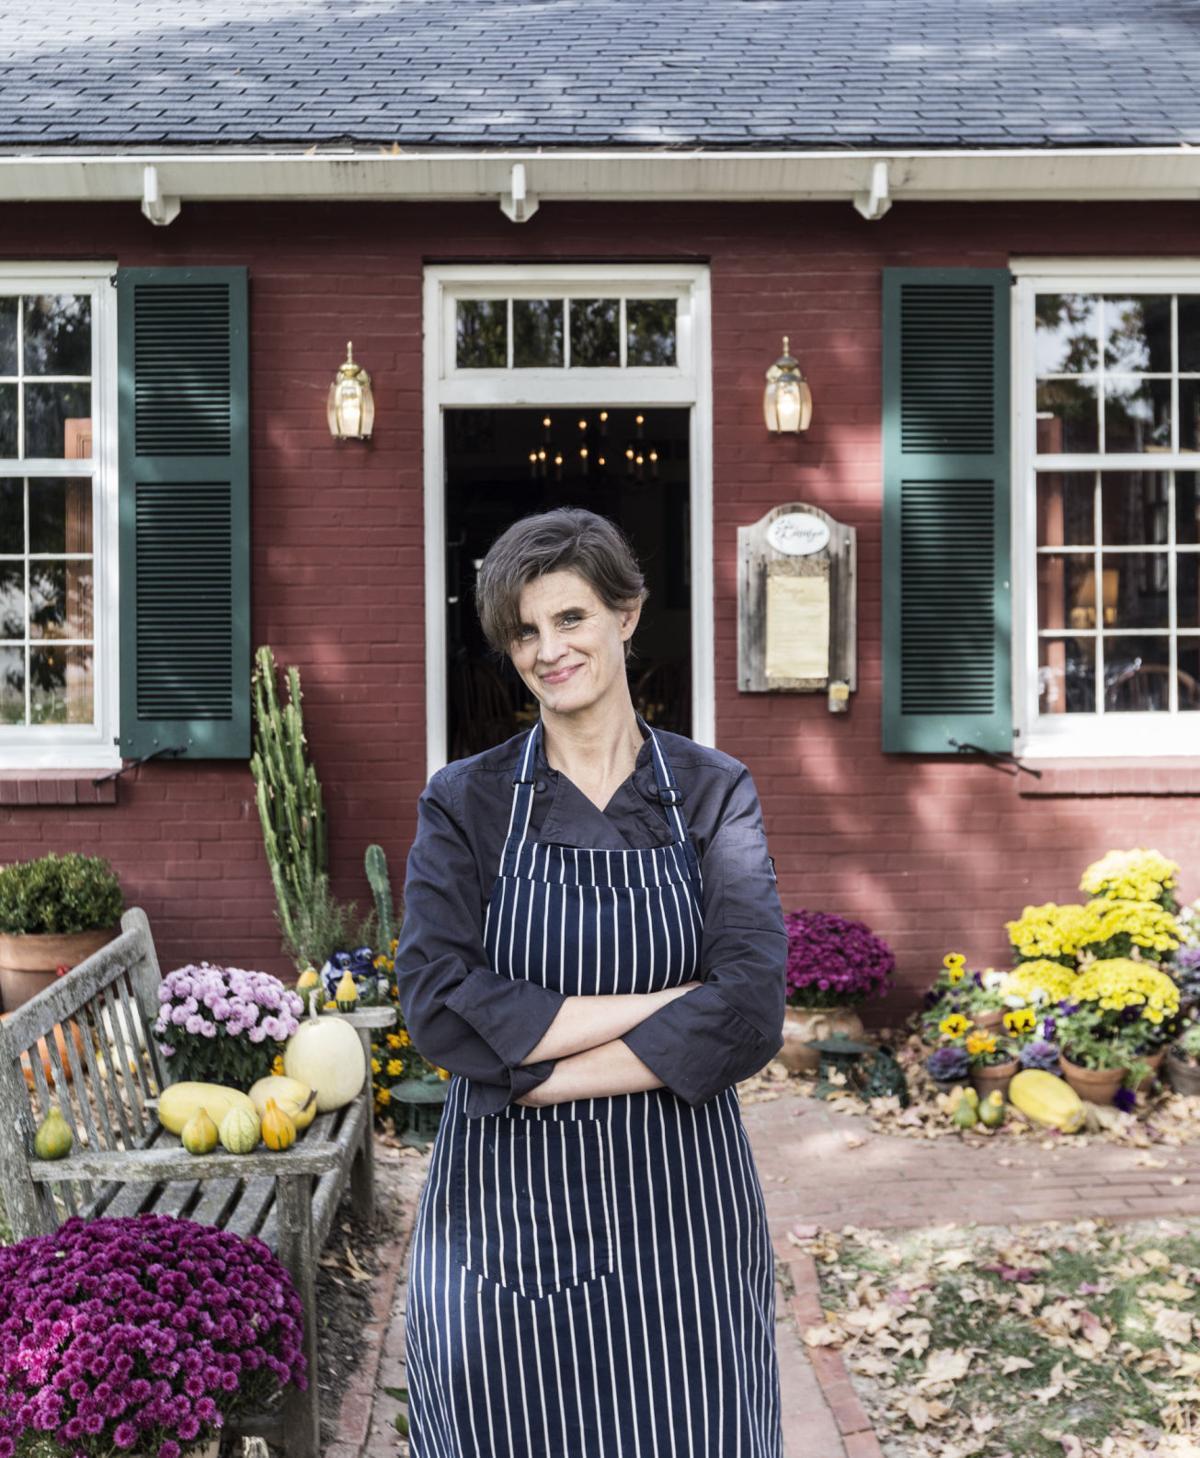 Chef Liz Huff